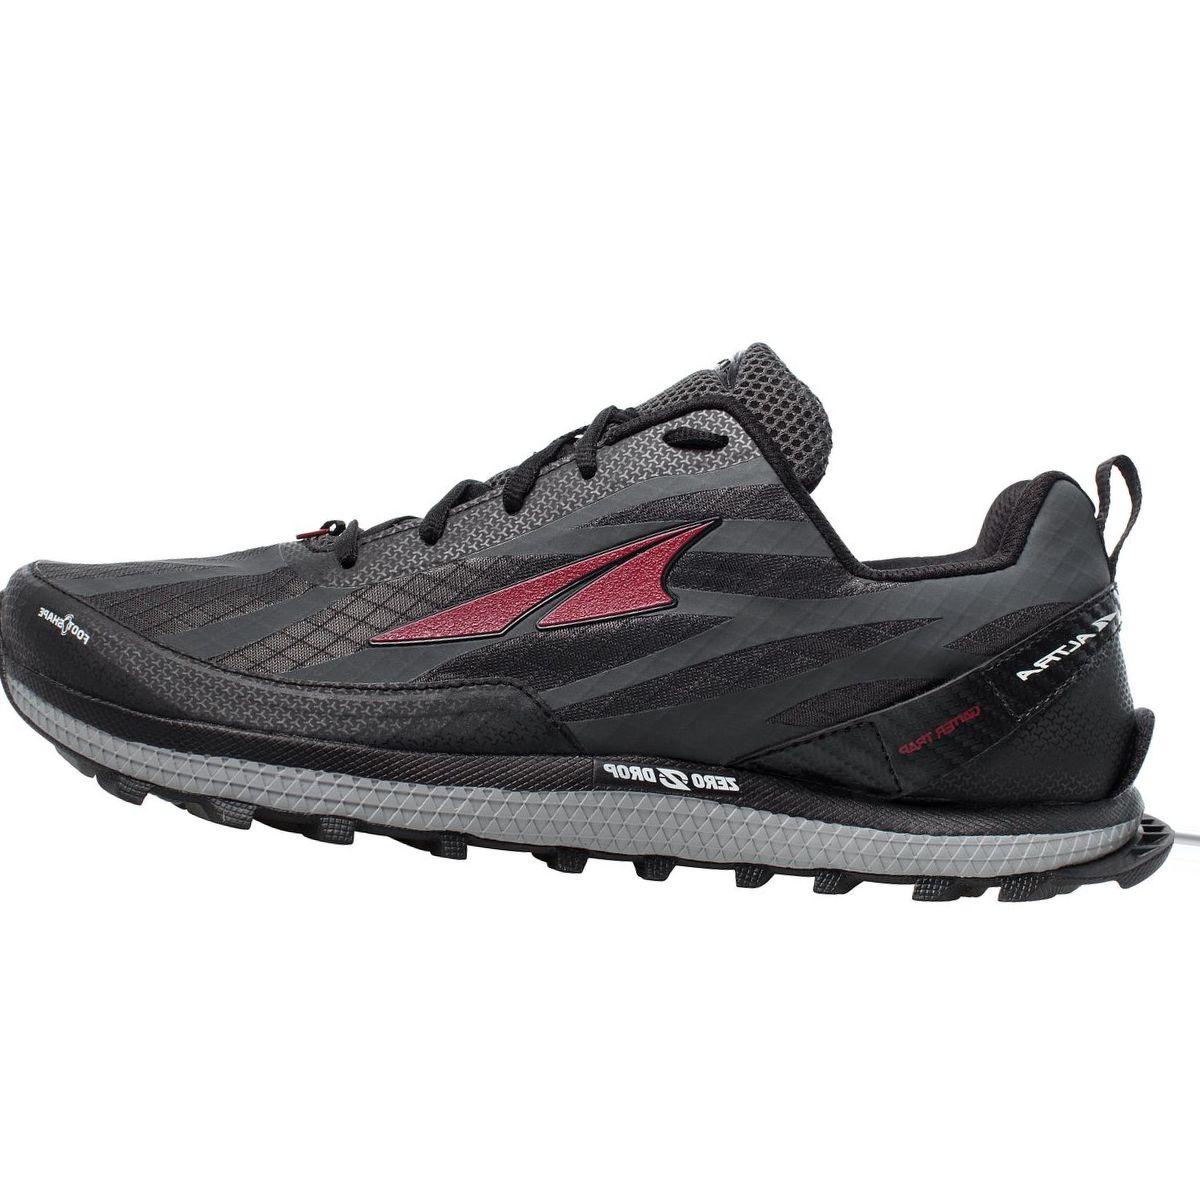 Altra Superior 3.5 Trail Running Shoe - Men's